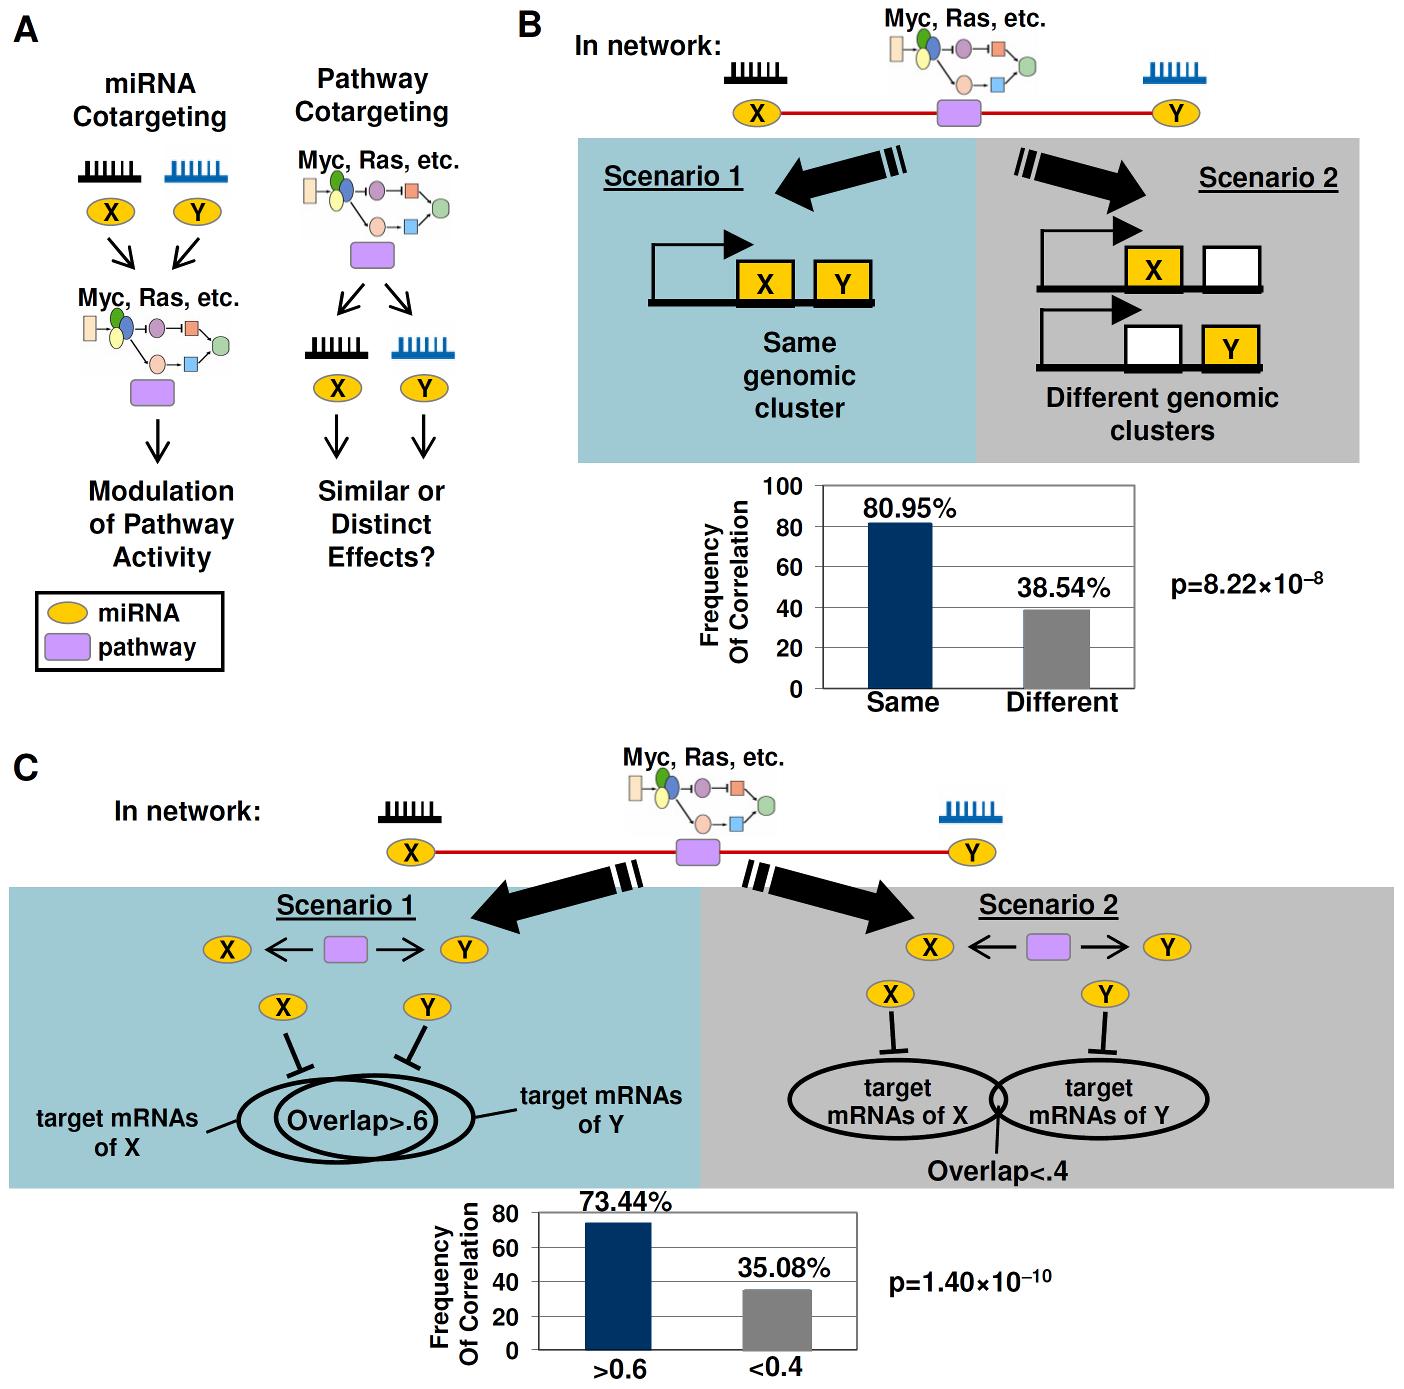 Cotargeting of miRNAs by oncogenic signaling pathways.